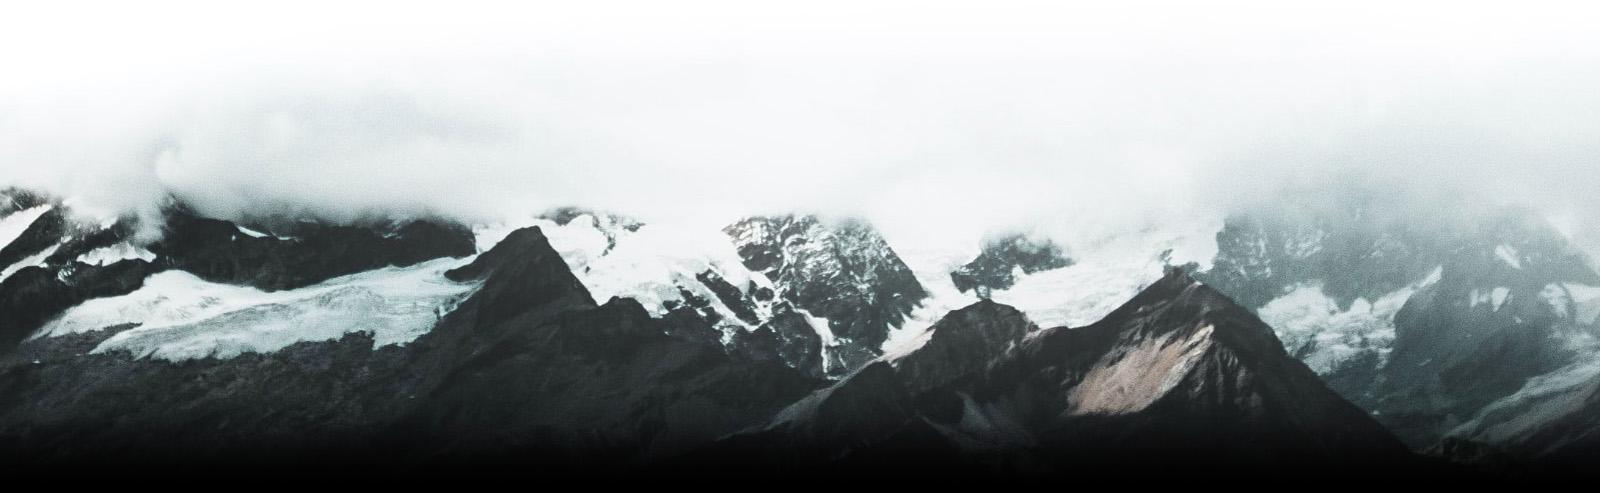 Cloud Covered Mountain Range